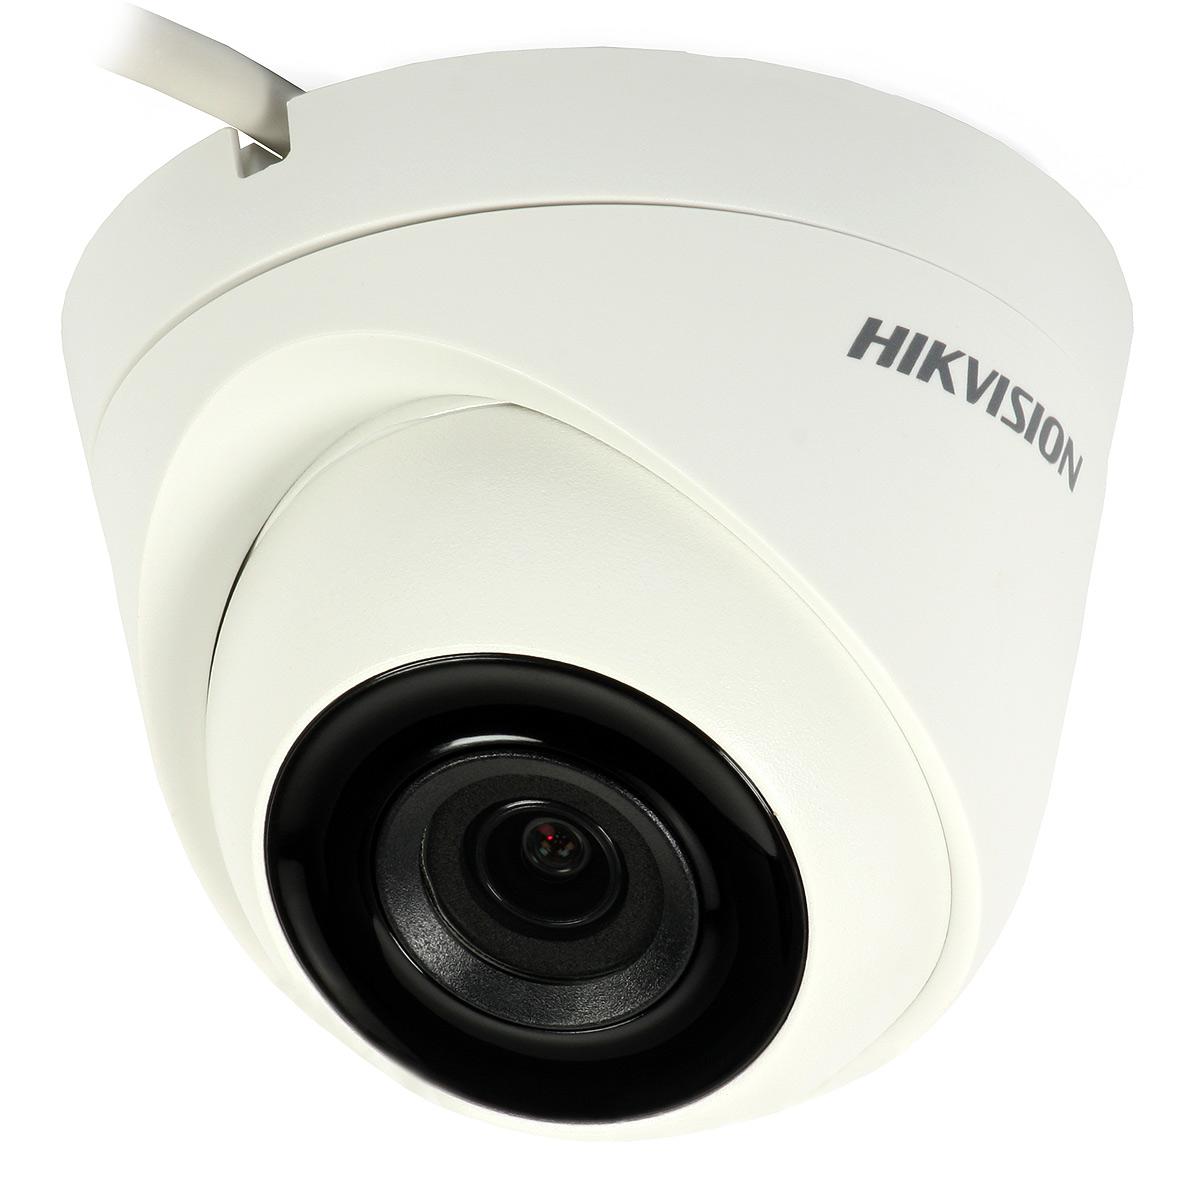 Ceiling IP Camera: Hikvision DS-2CD1321-I (D) (2MP, 2 8mm